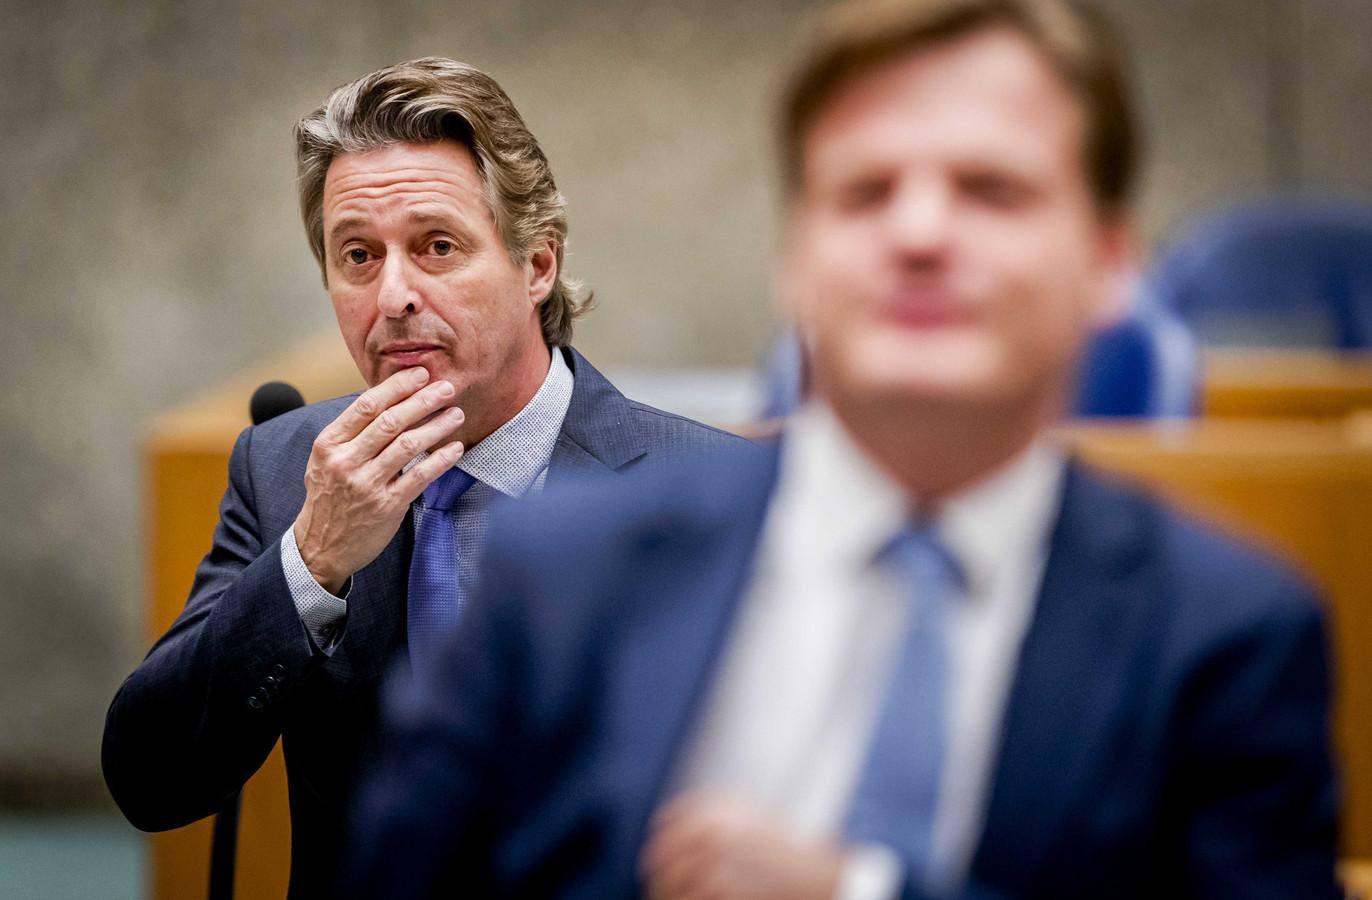 PVV'er Edgar Mulder uit Zwolle.